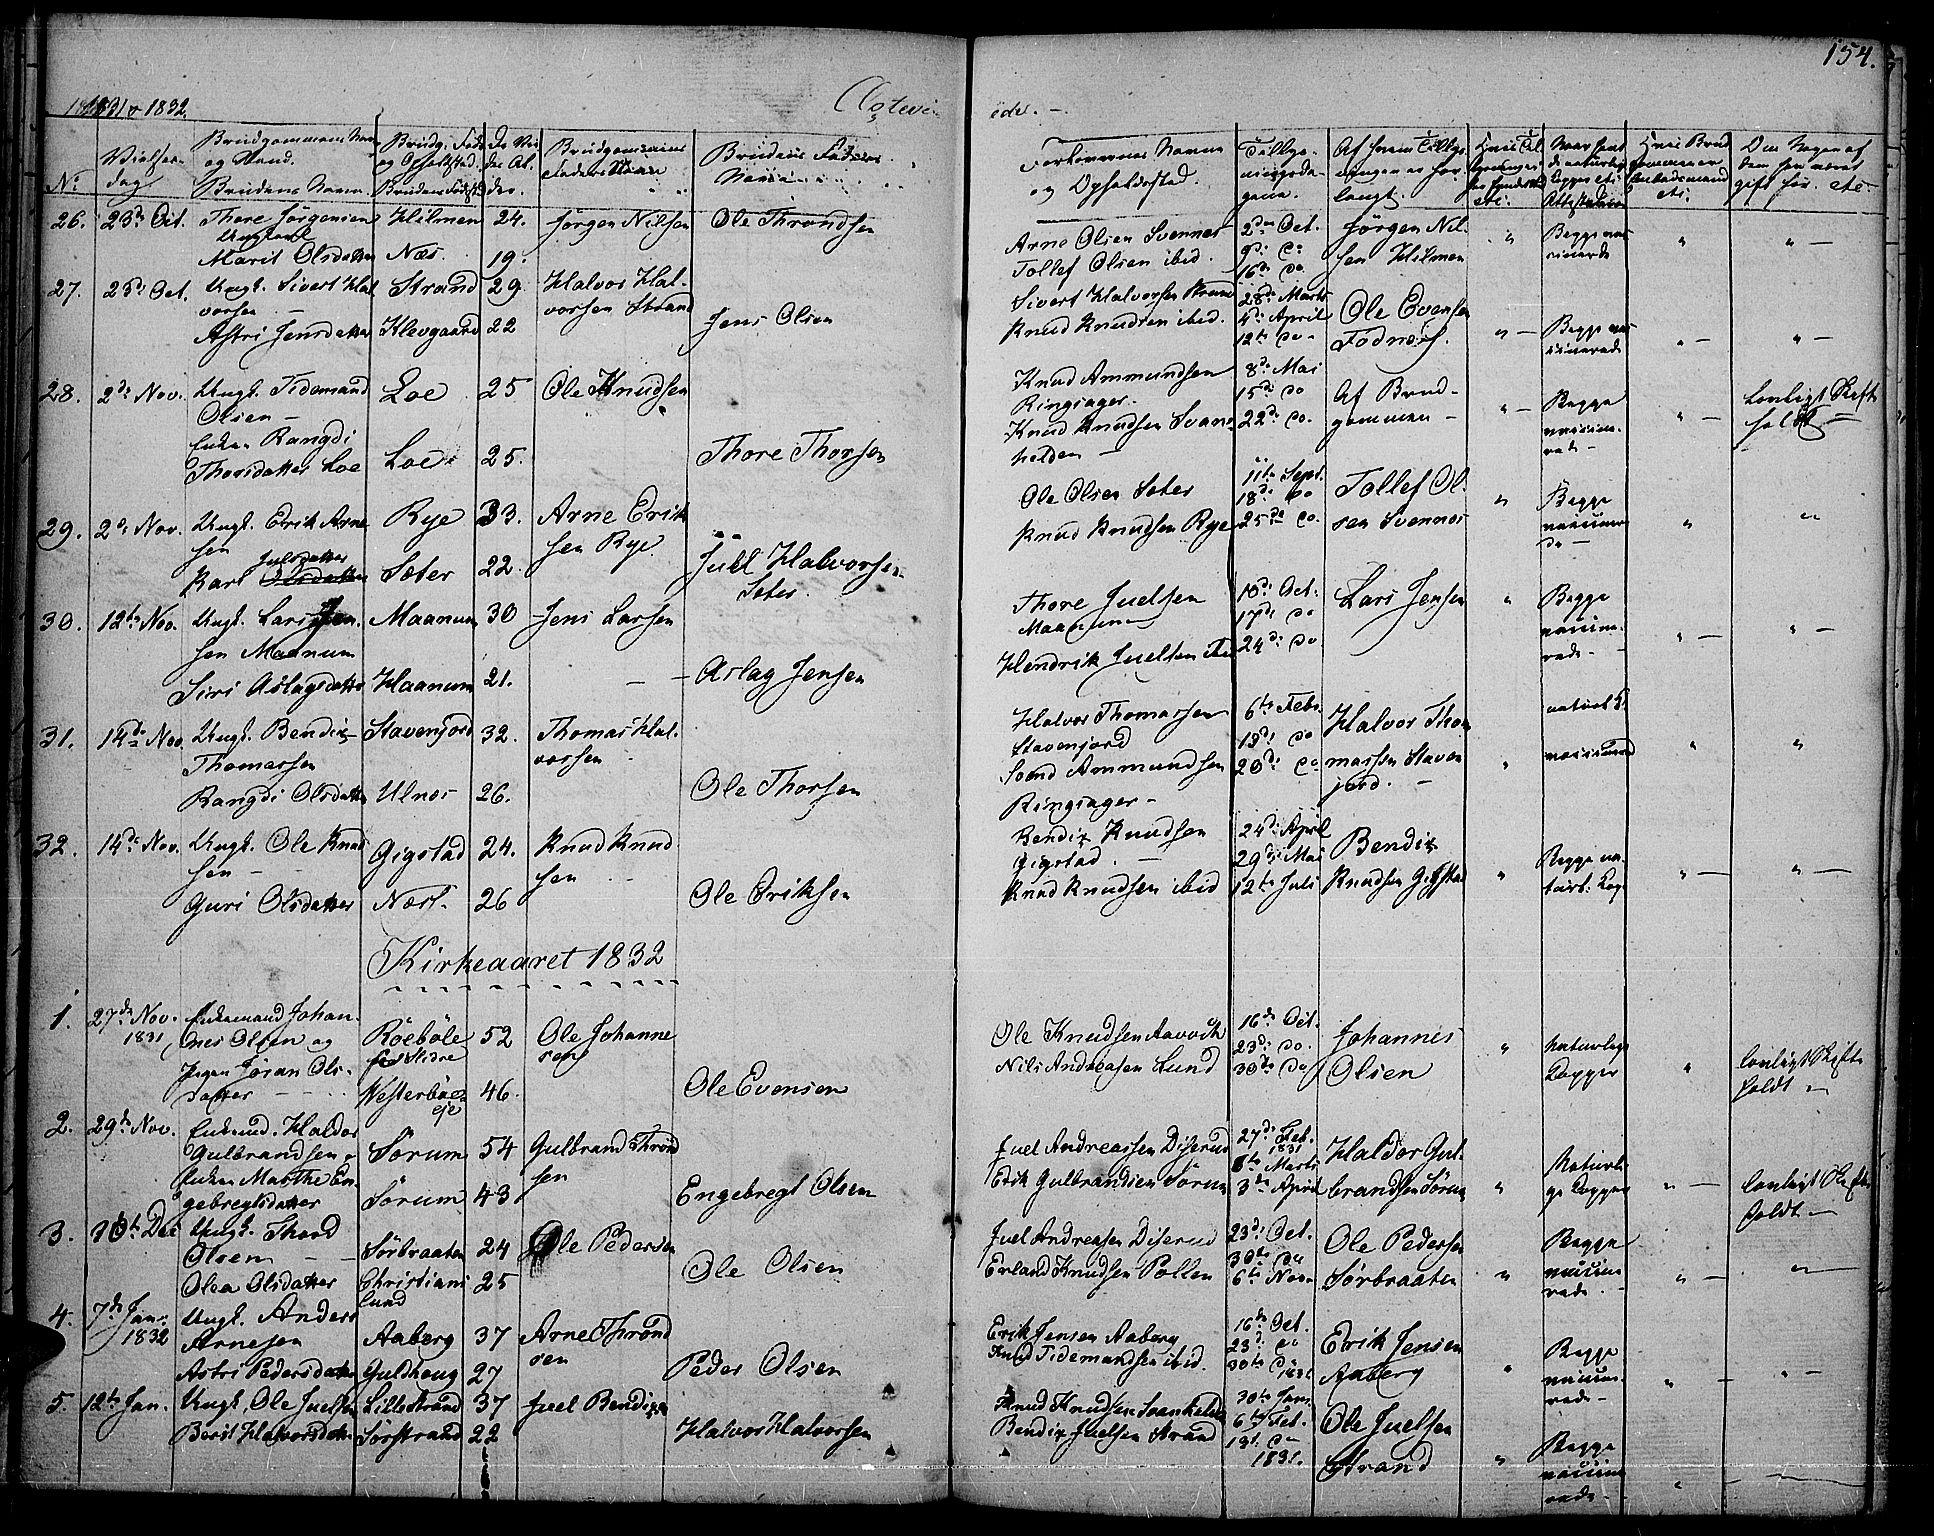 SAH, Nord-Aurdal prestekontor, Ministerialbok nr. 3, 1828-1841, s. 154